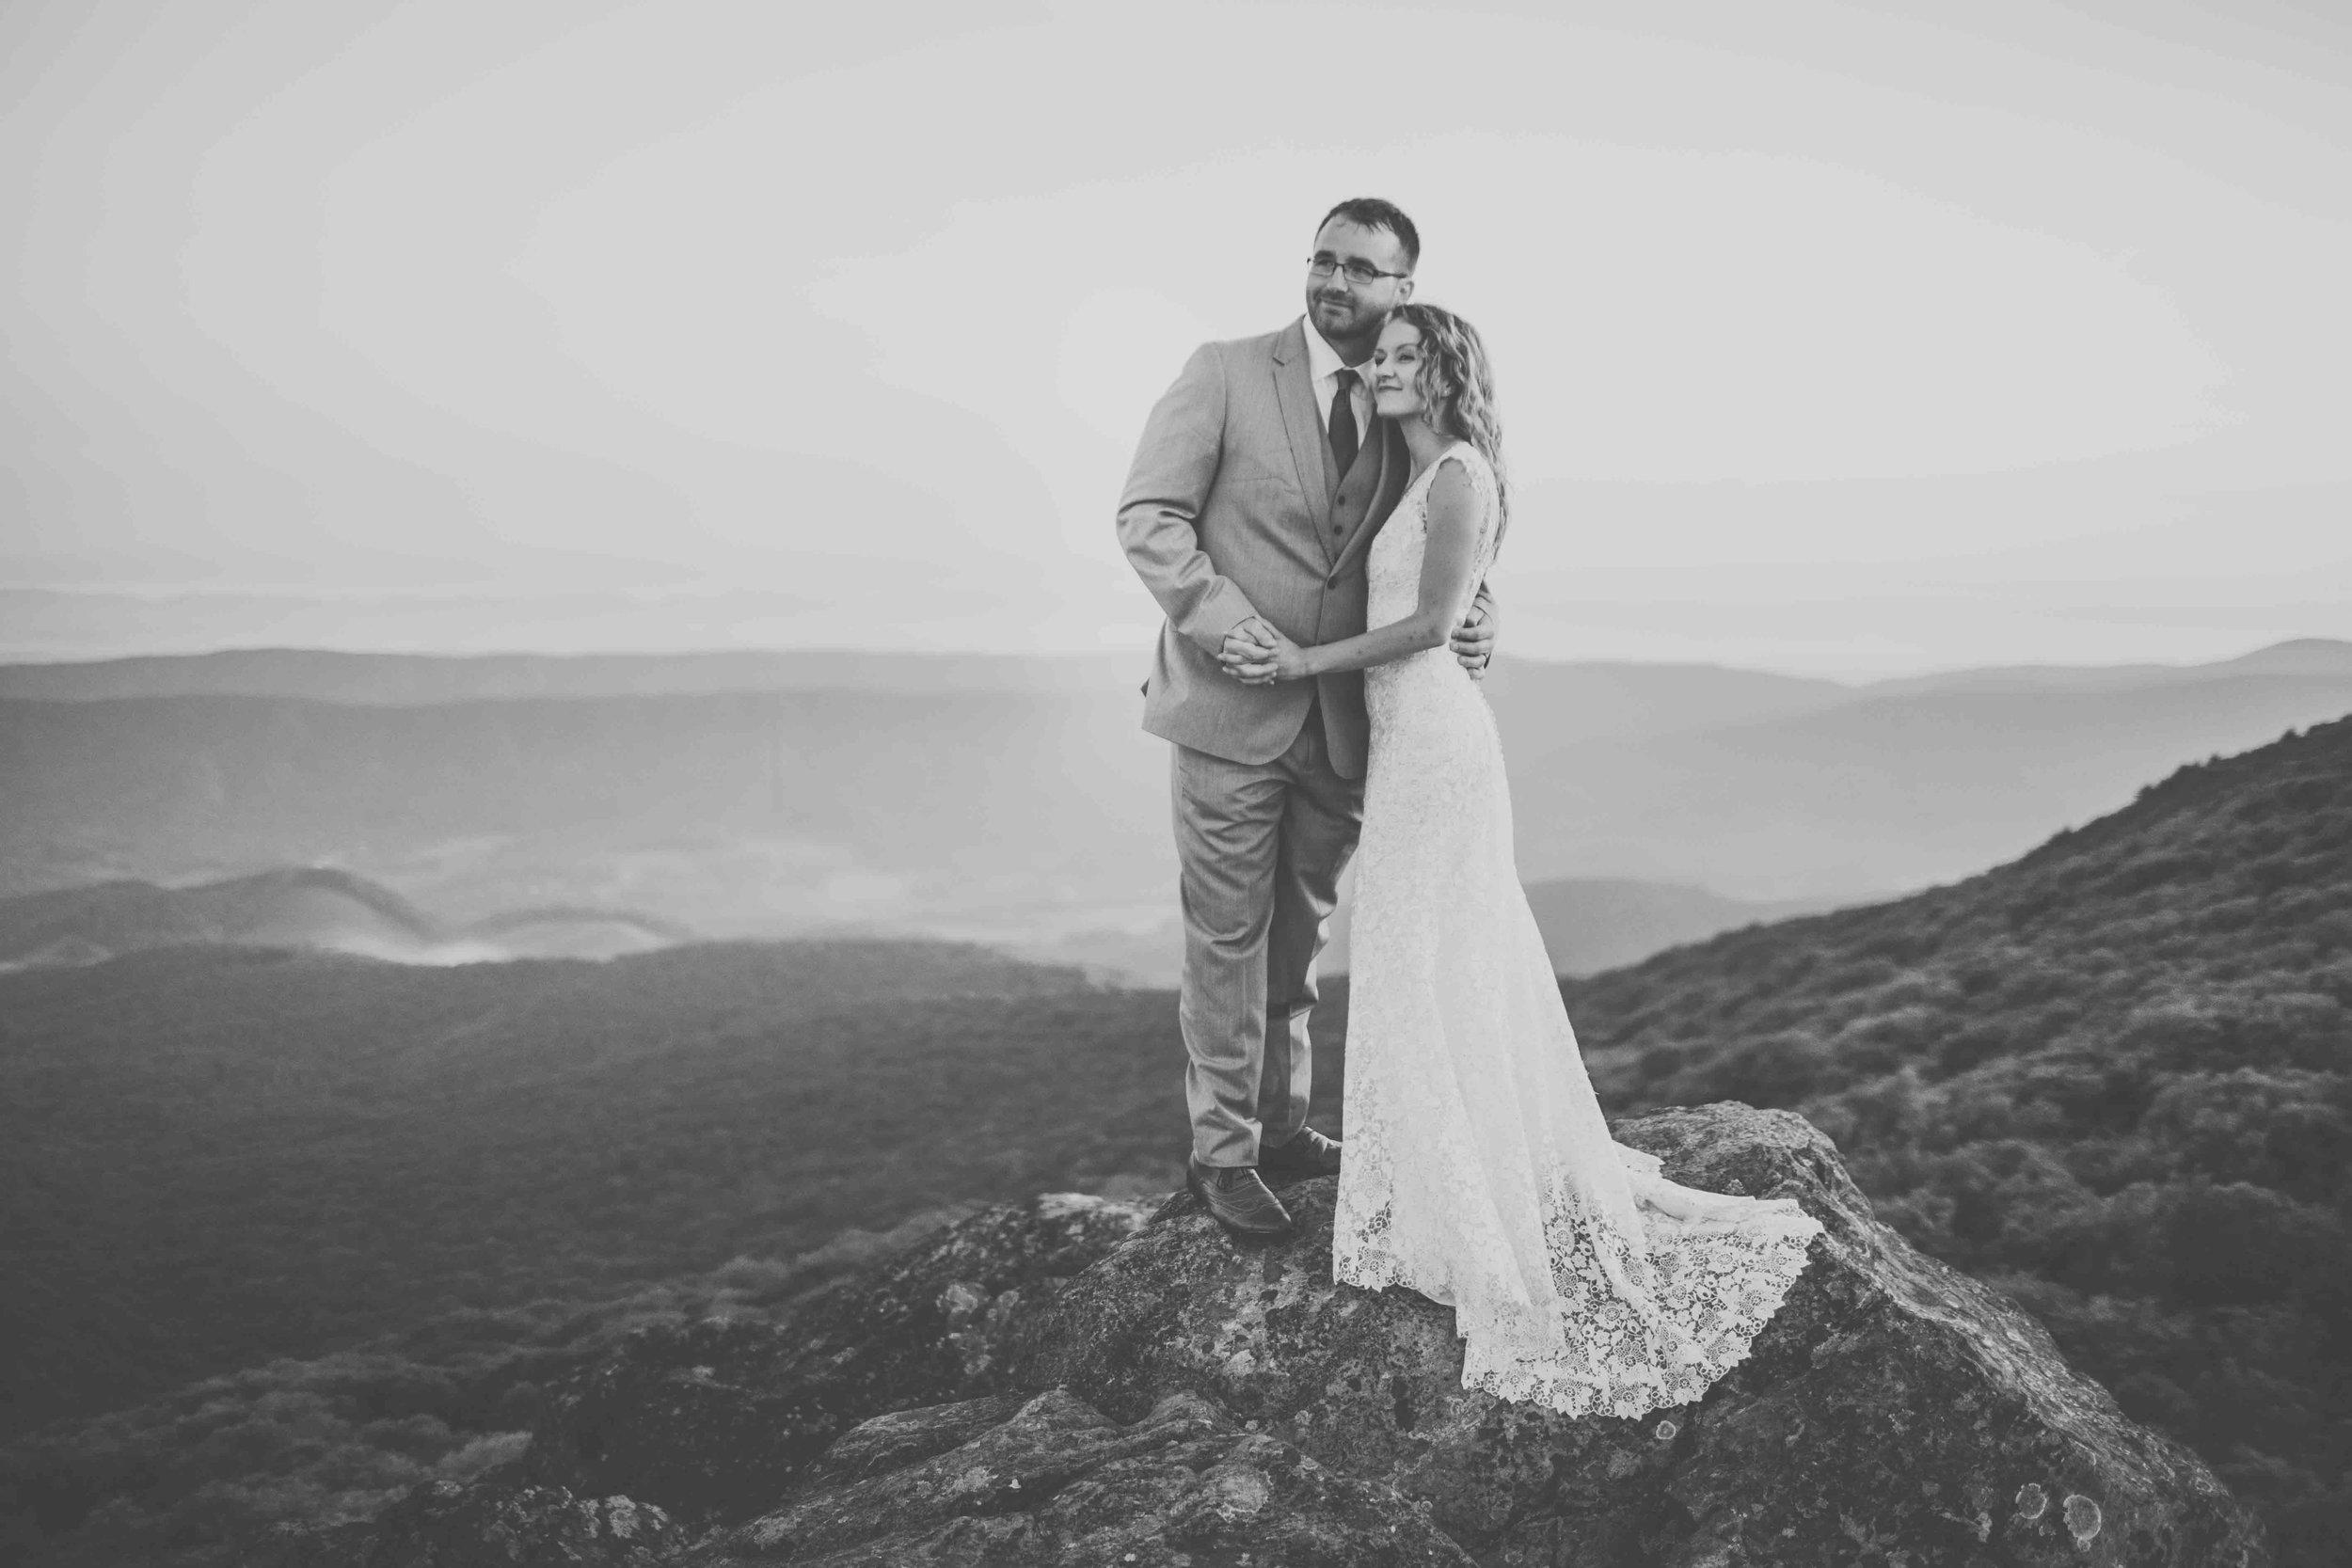 north-carolina-elopement-photographer-52.jpg